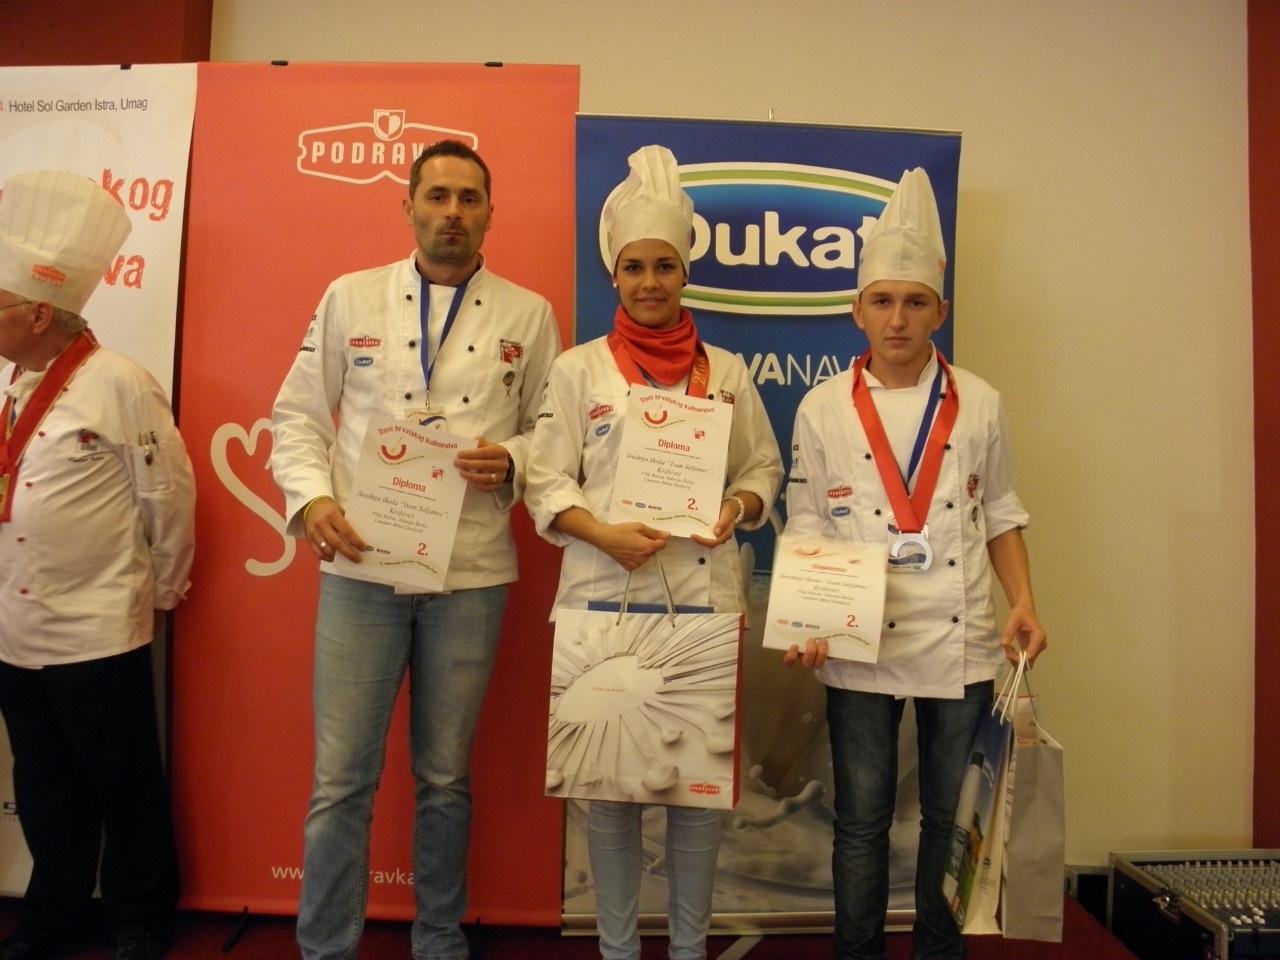 IMG_3259_Kamelija_kup_kuhari_konobari_natjecanje_Misel_Doskocil